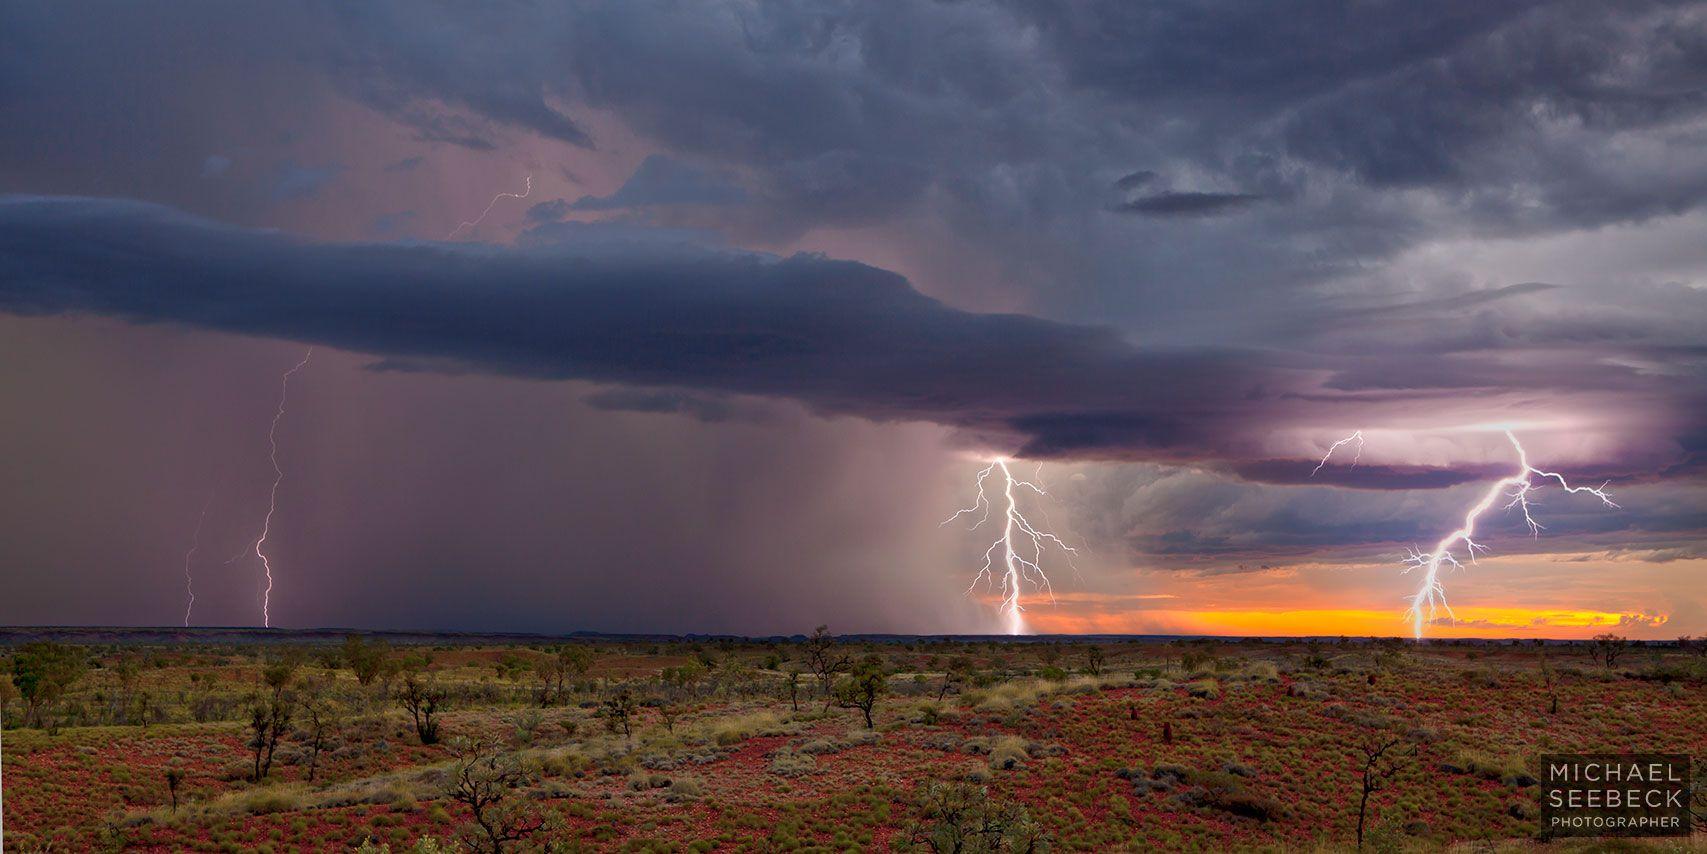 Desert storm dates in Perth